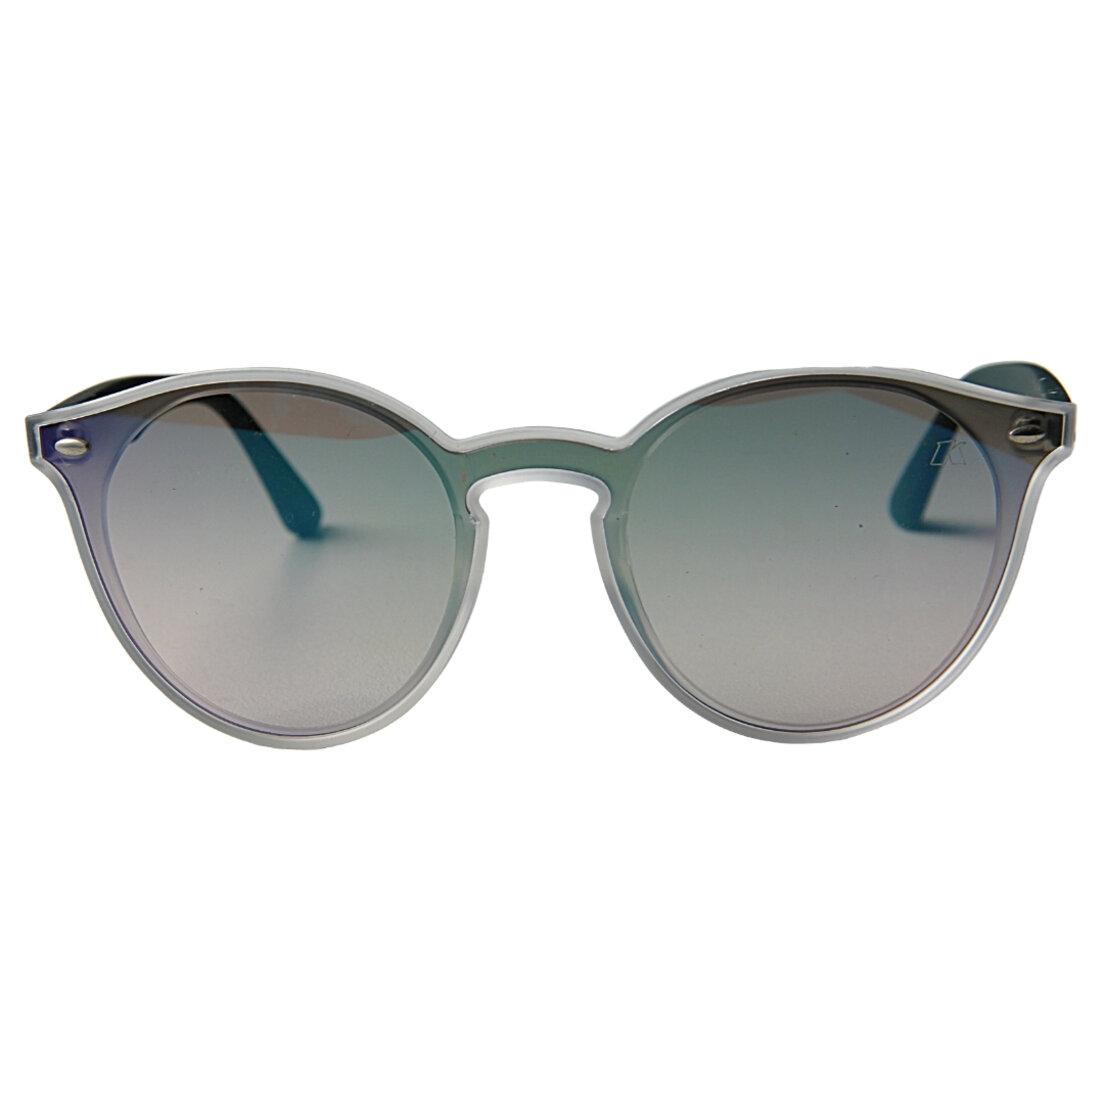 OUTLET - Óculos de Sol Khatto Round Young Colors